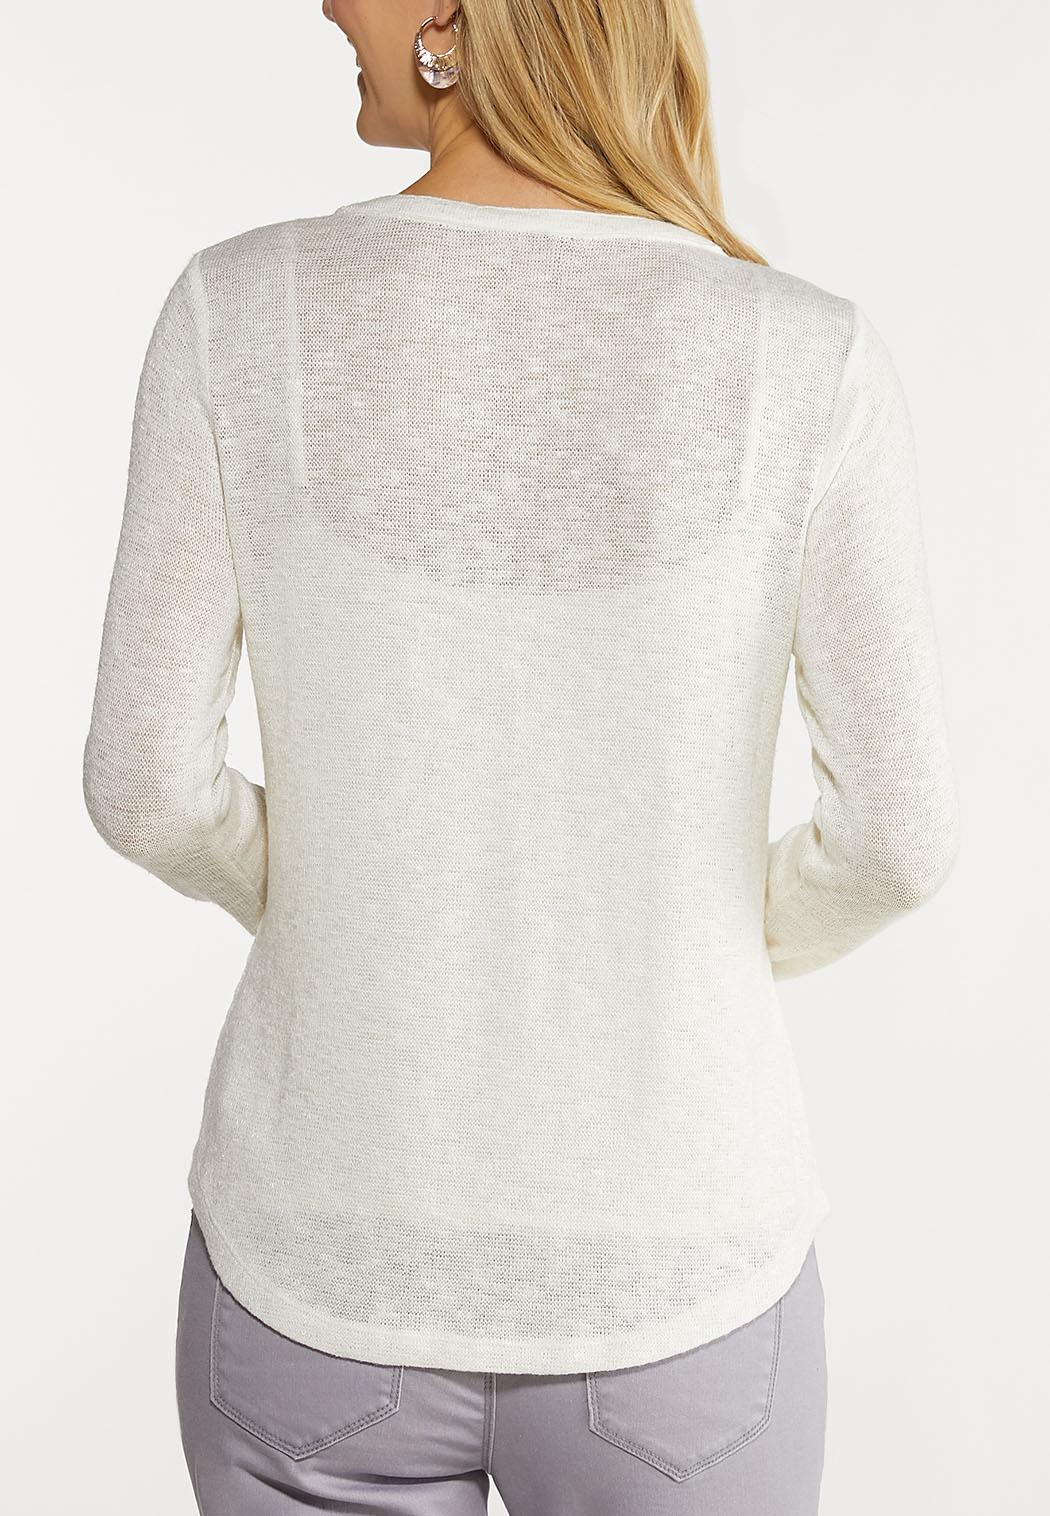 Plus Size Crochet Henley Top (Item #44093058)